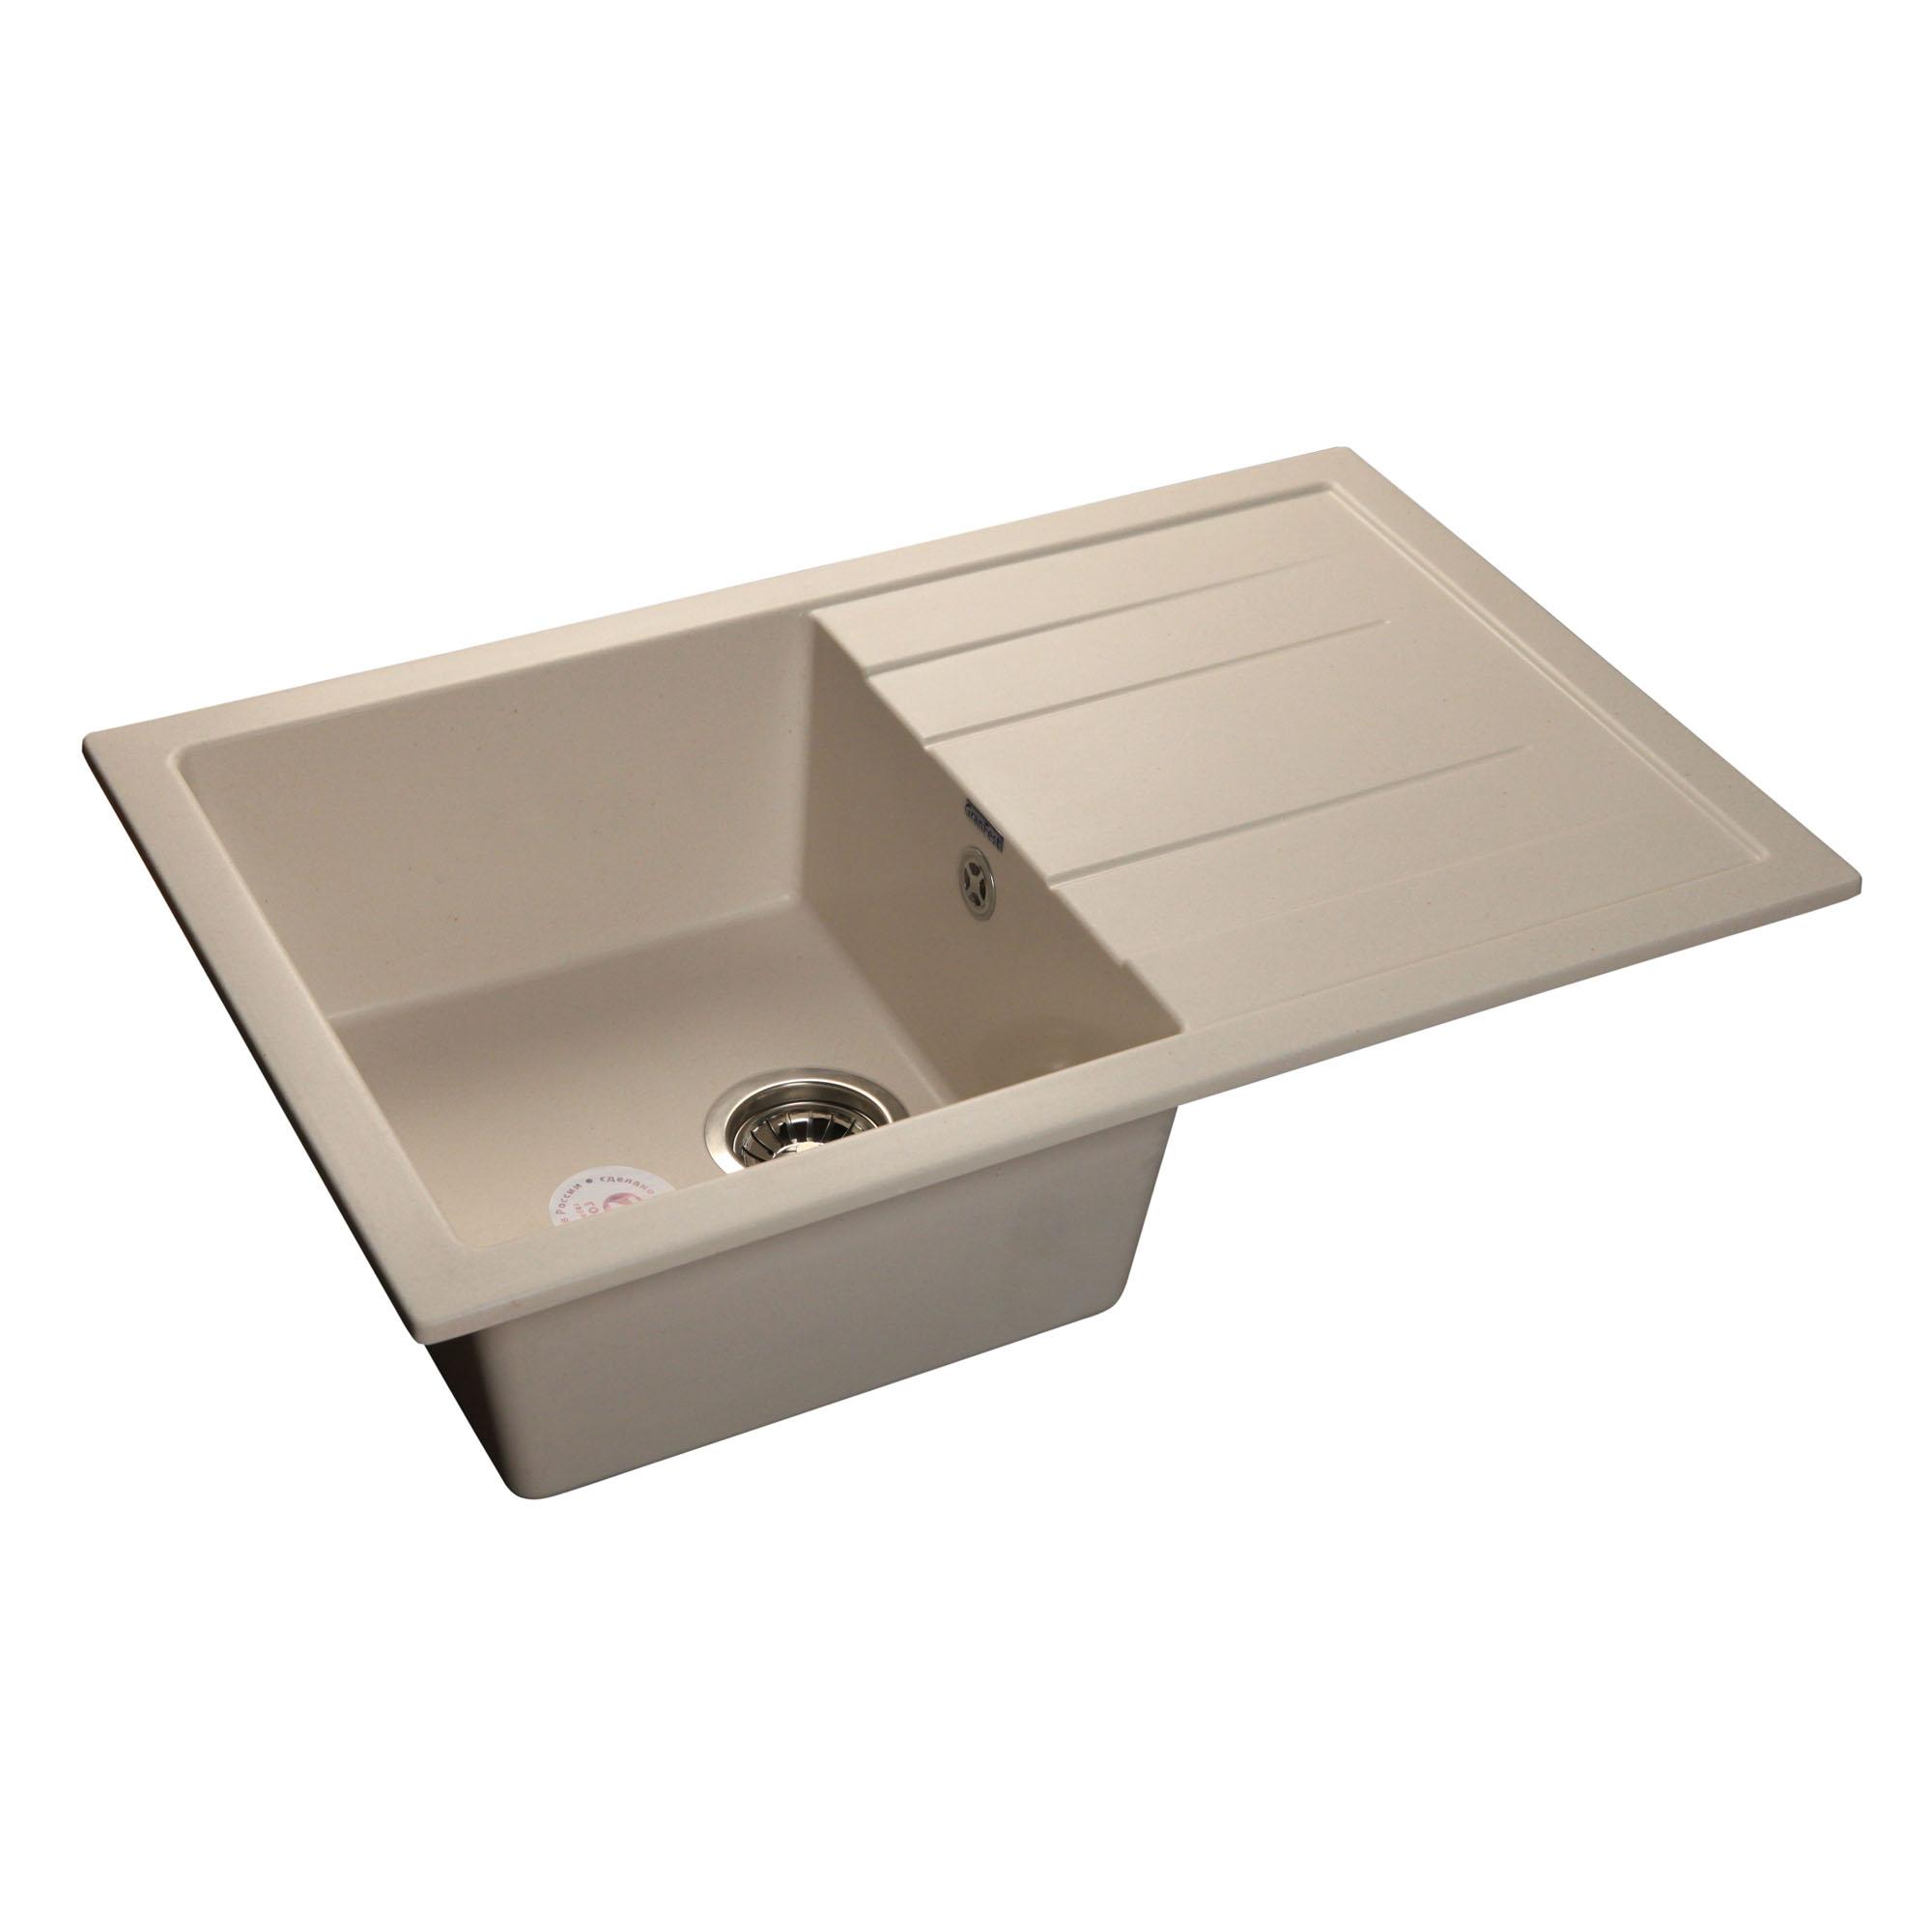 Кухонная мойка GranFest Quadro GF-Q780L белый мойка кухонная weissgauff quadro 800 eco granit белый